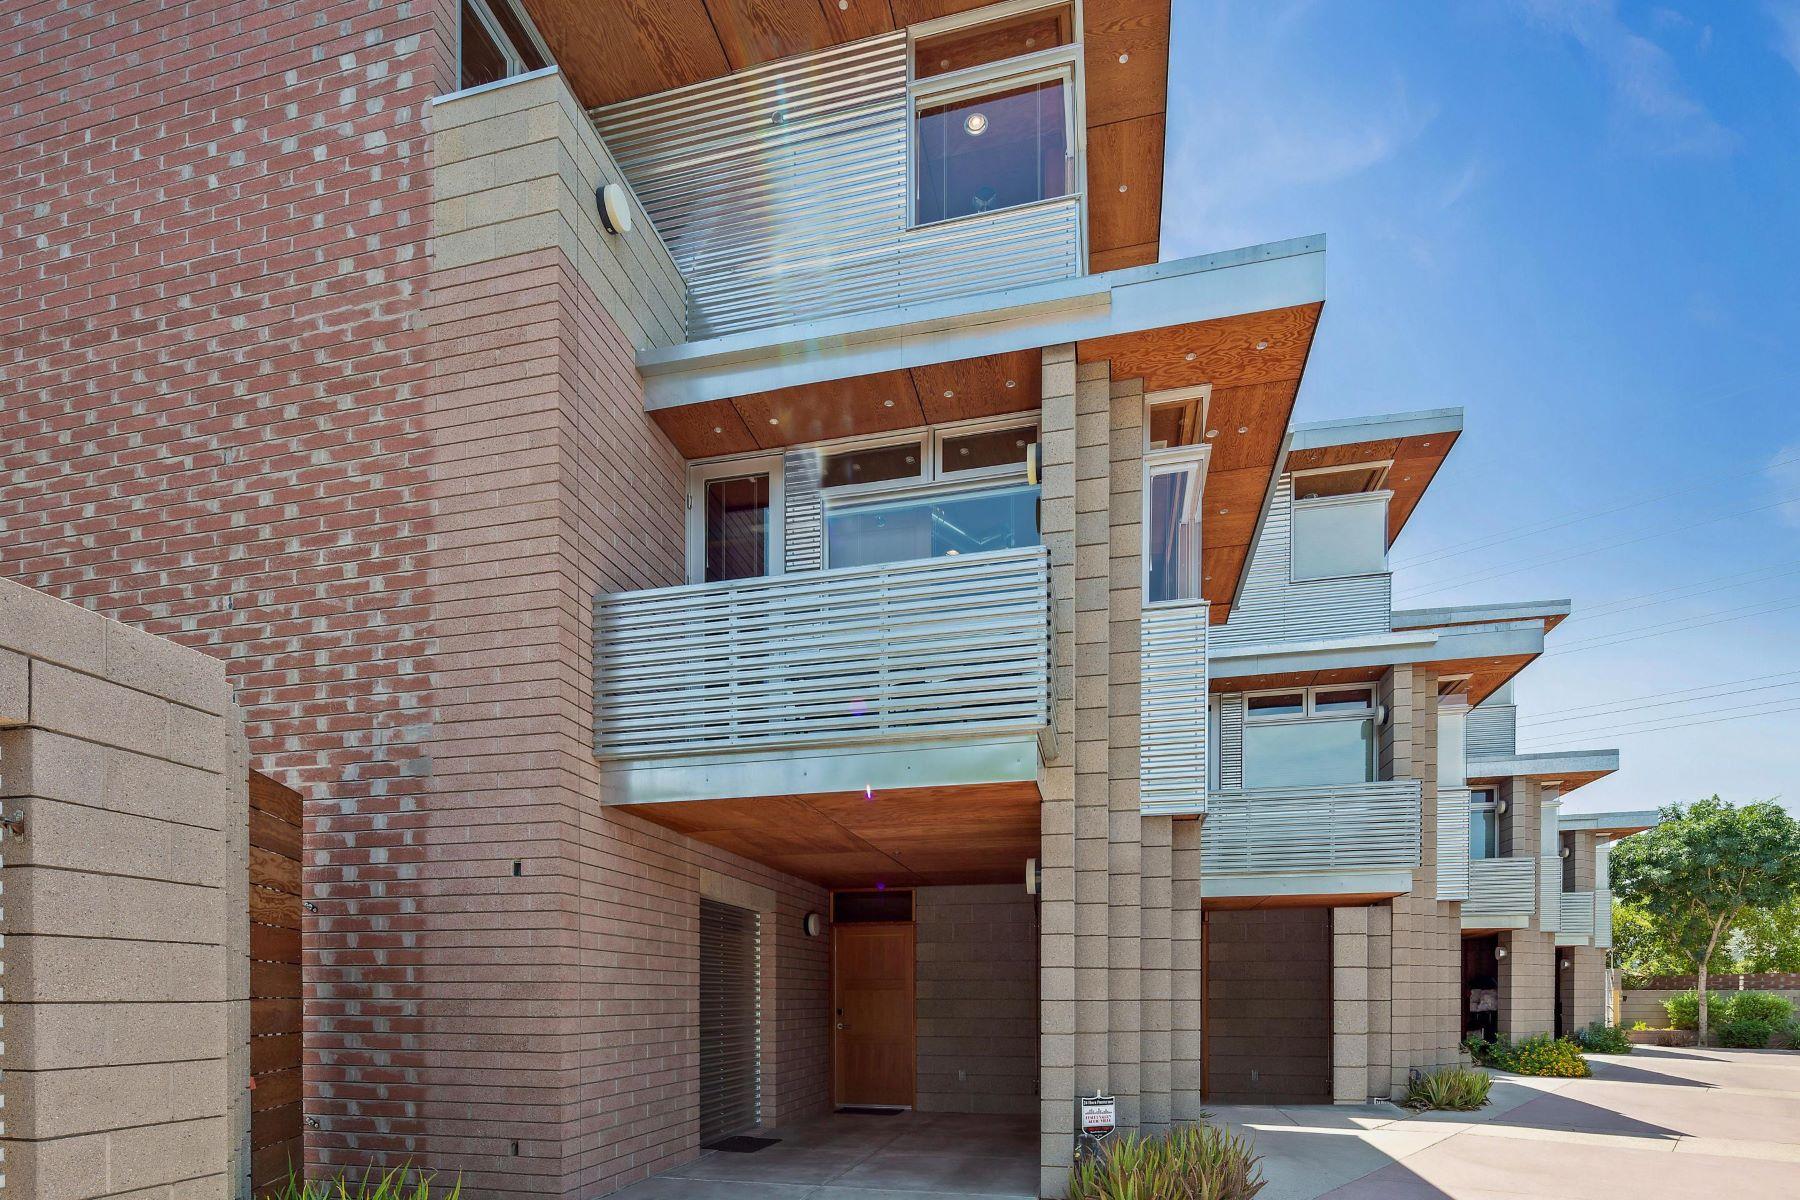 townhouses por un Venta en Sienna Court Lofts 930 S Ash Ave Tempe, Arizona 85281 Estados Unidos